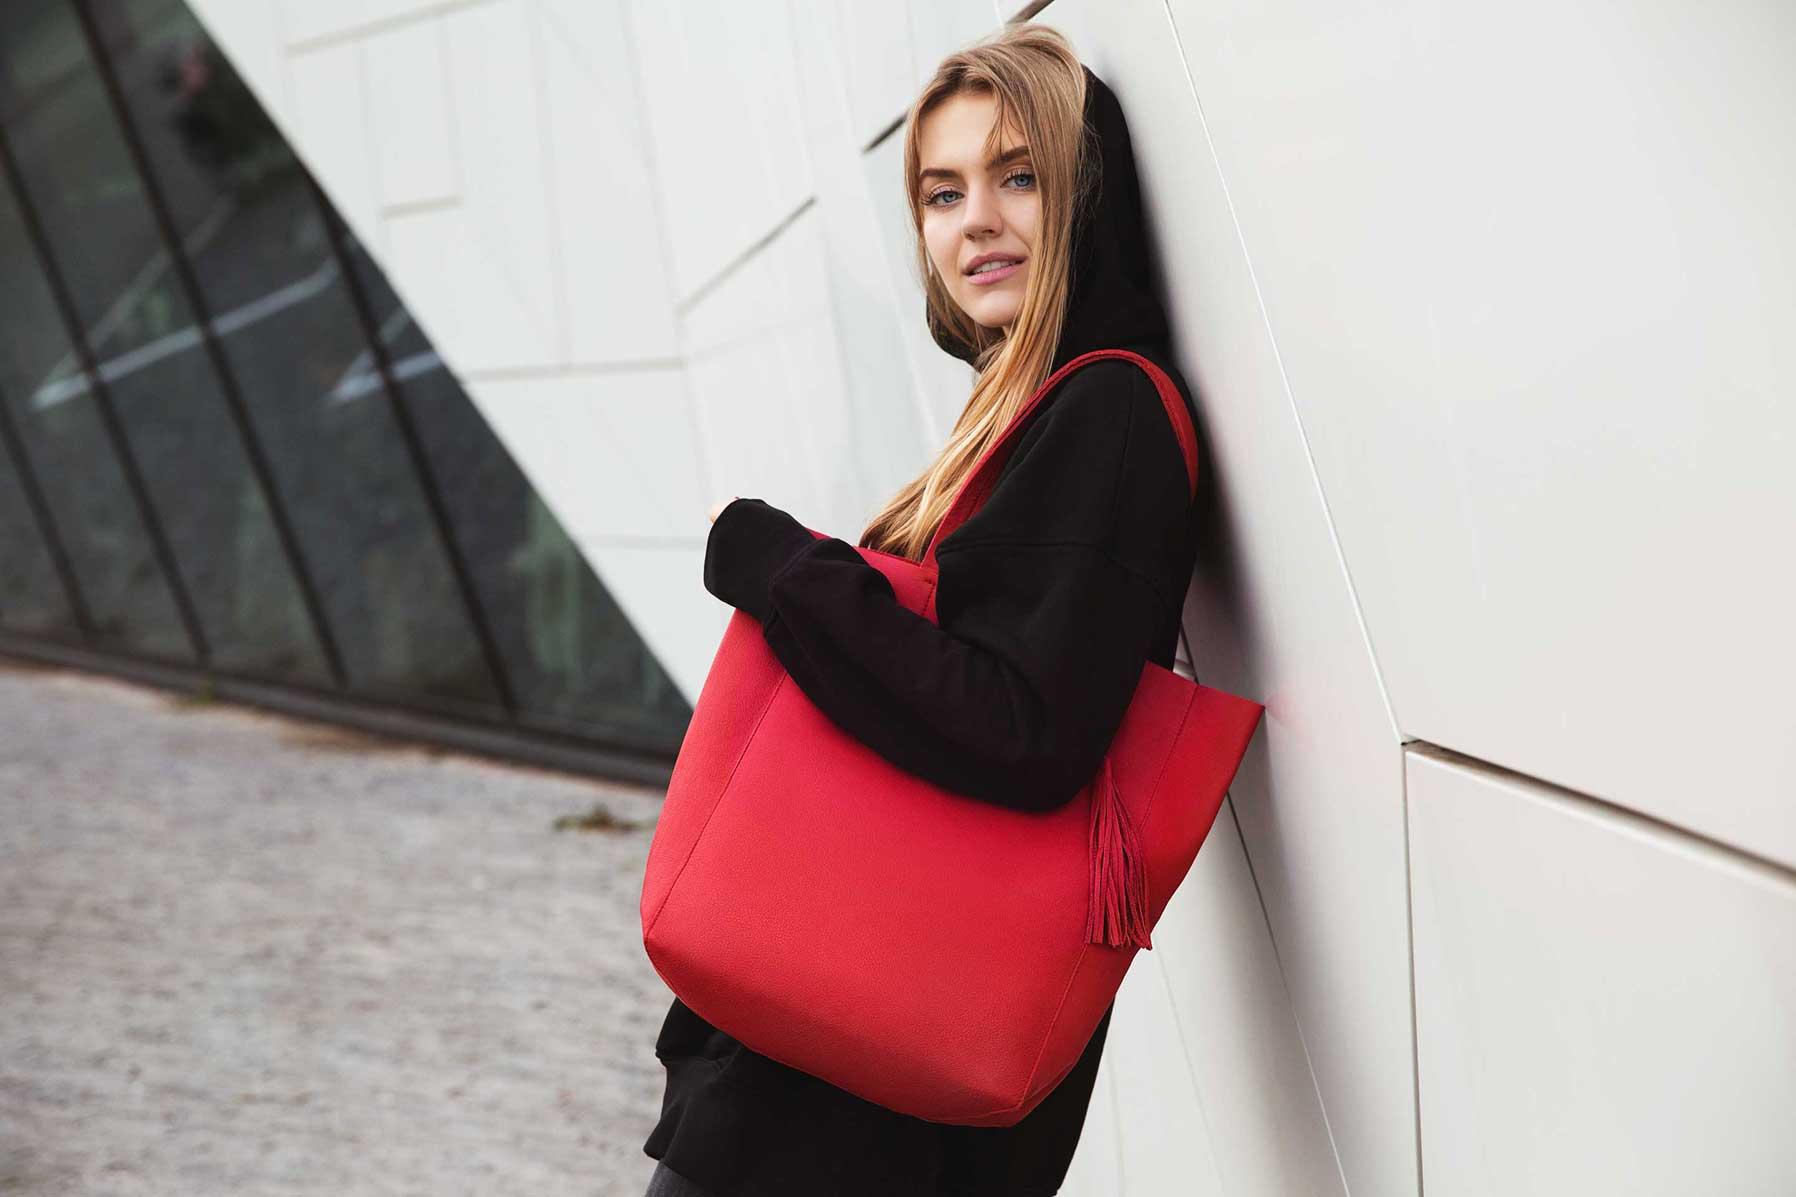 Visuel ordinari - sac modèle Shopper Bag Rouge sur mannequin en hoodie hoodie noir